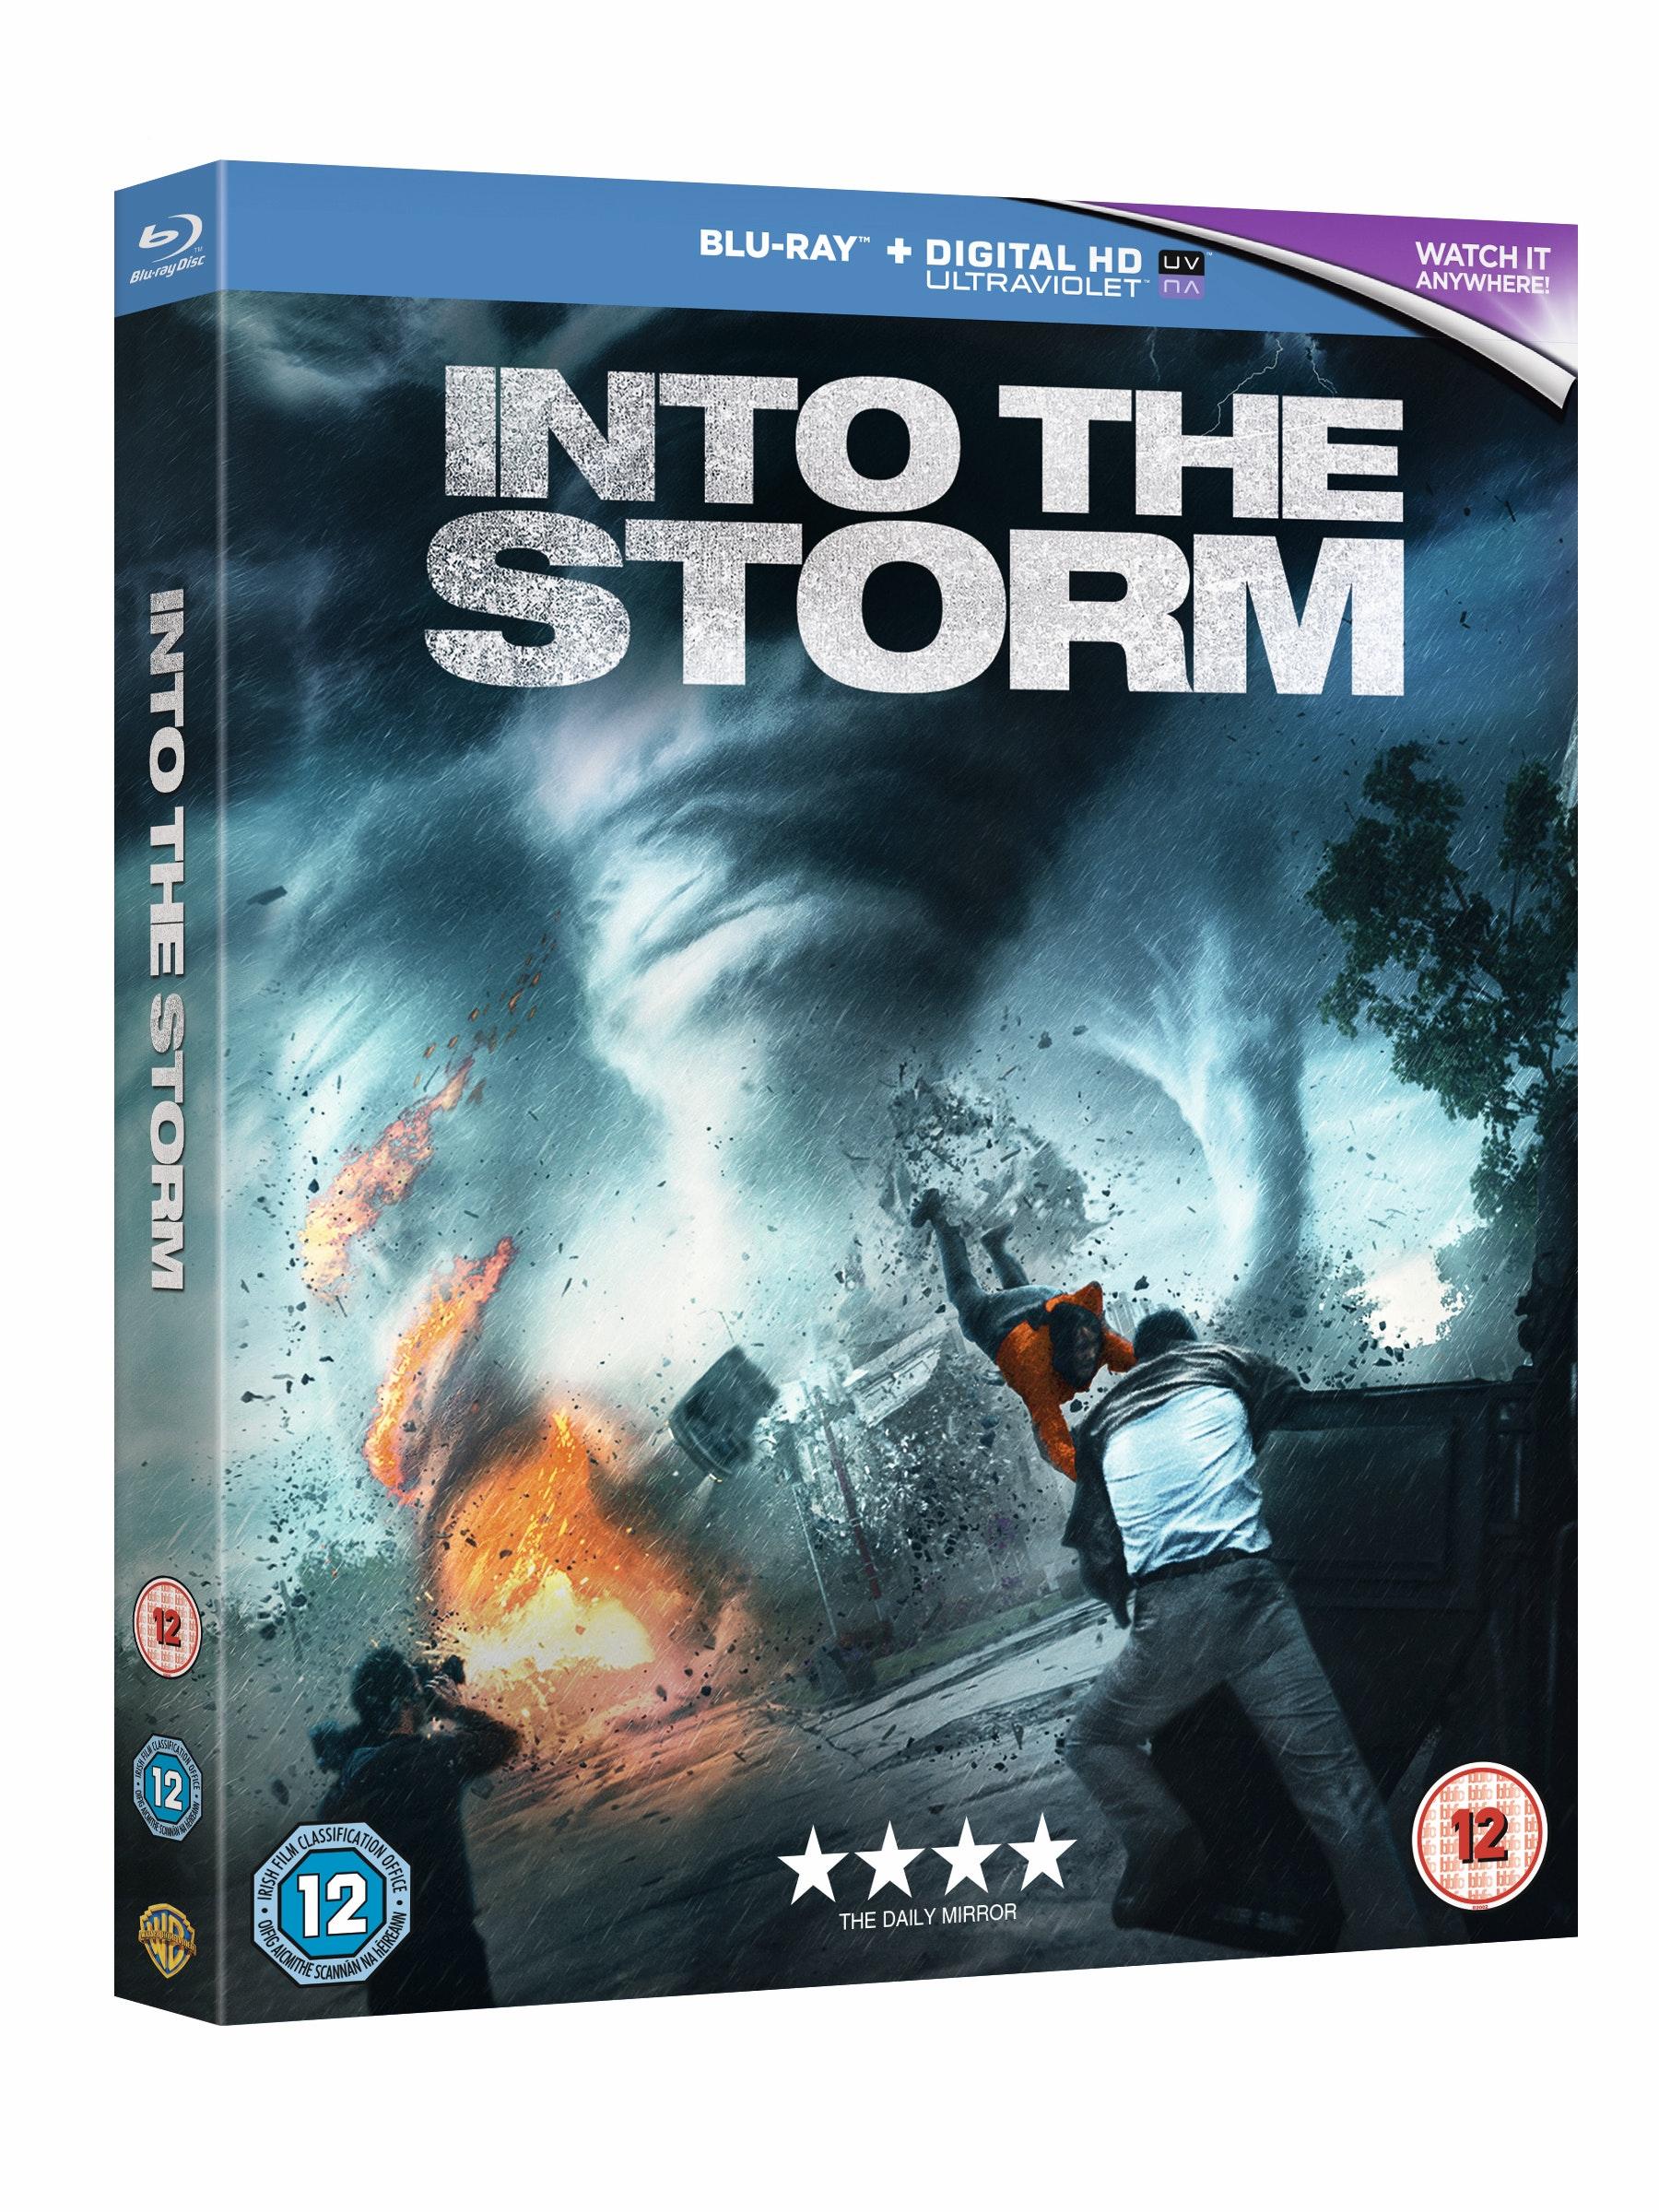 Intostorm uk bd 3d oring 0